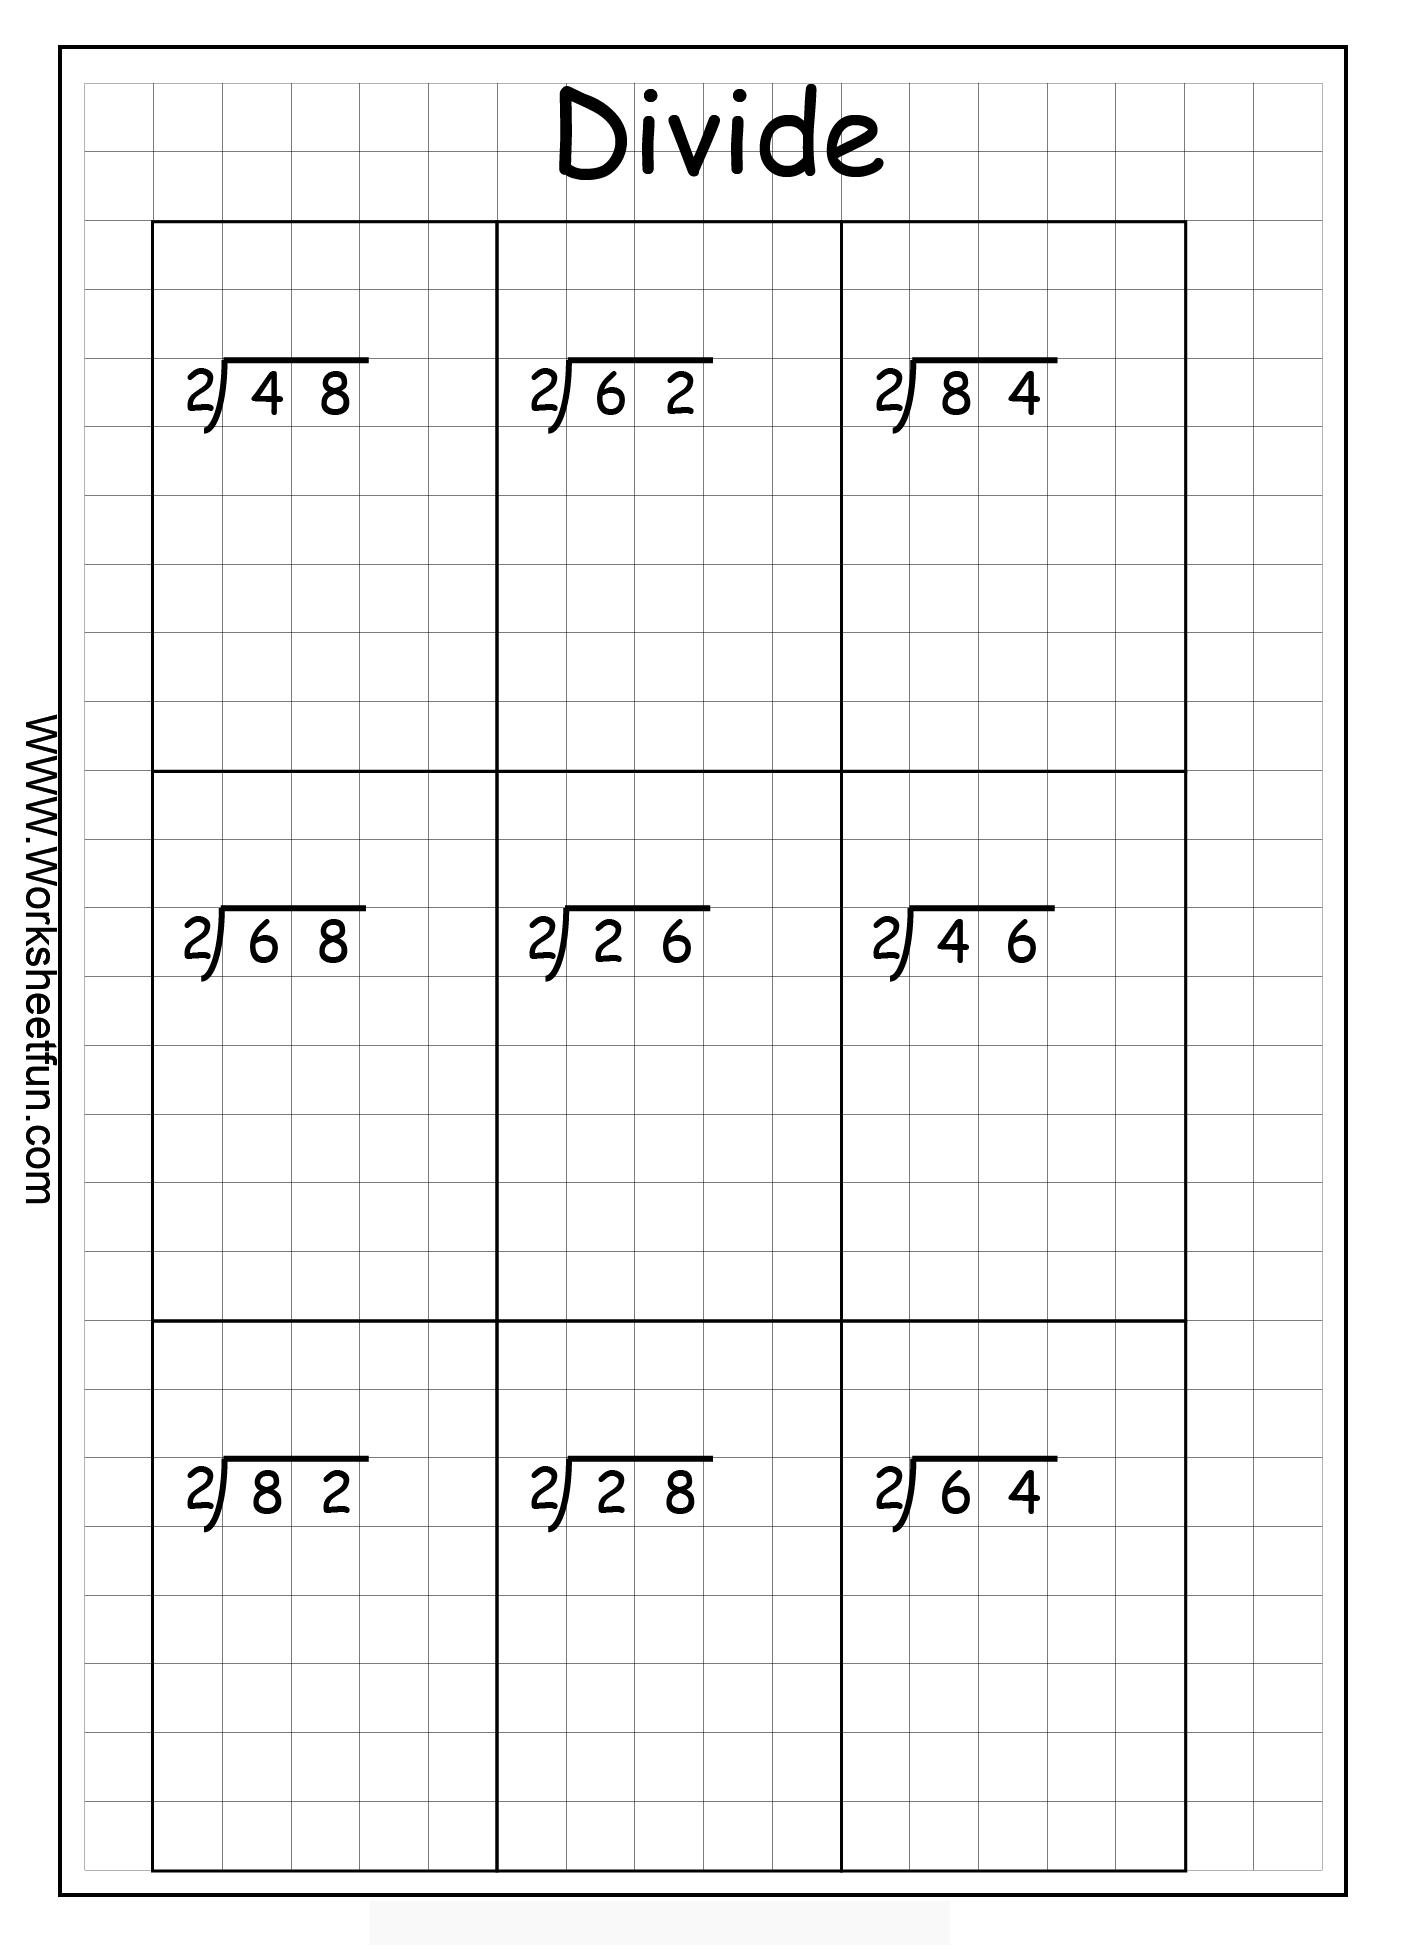 Simple Division Worksheet long division worksheets – Beginning Division Worksheet